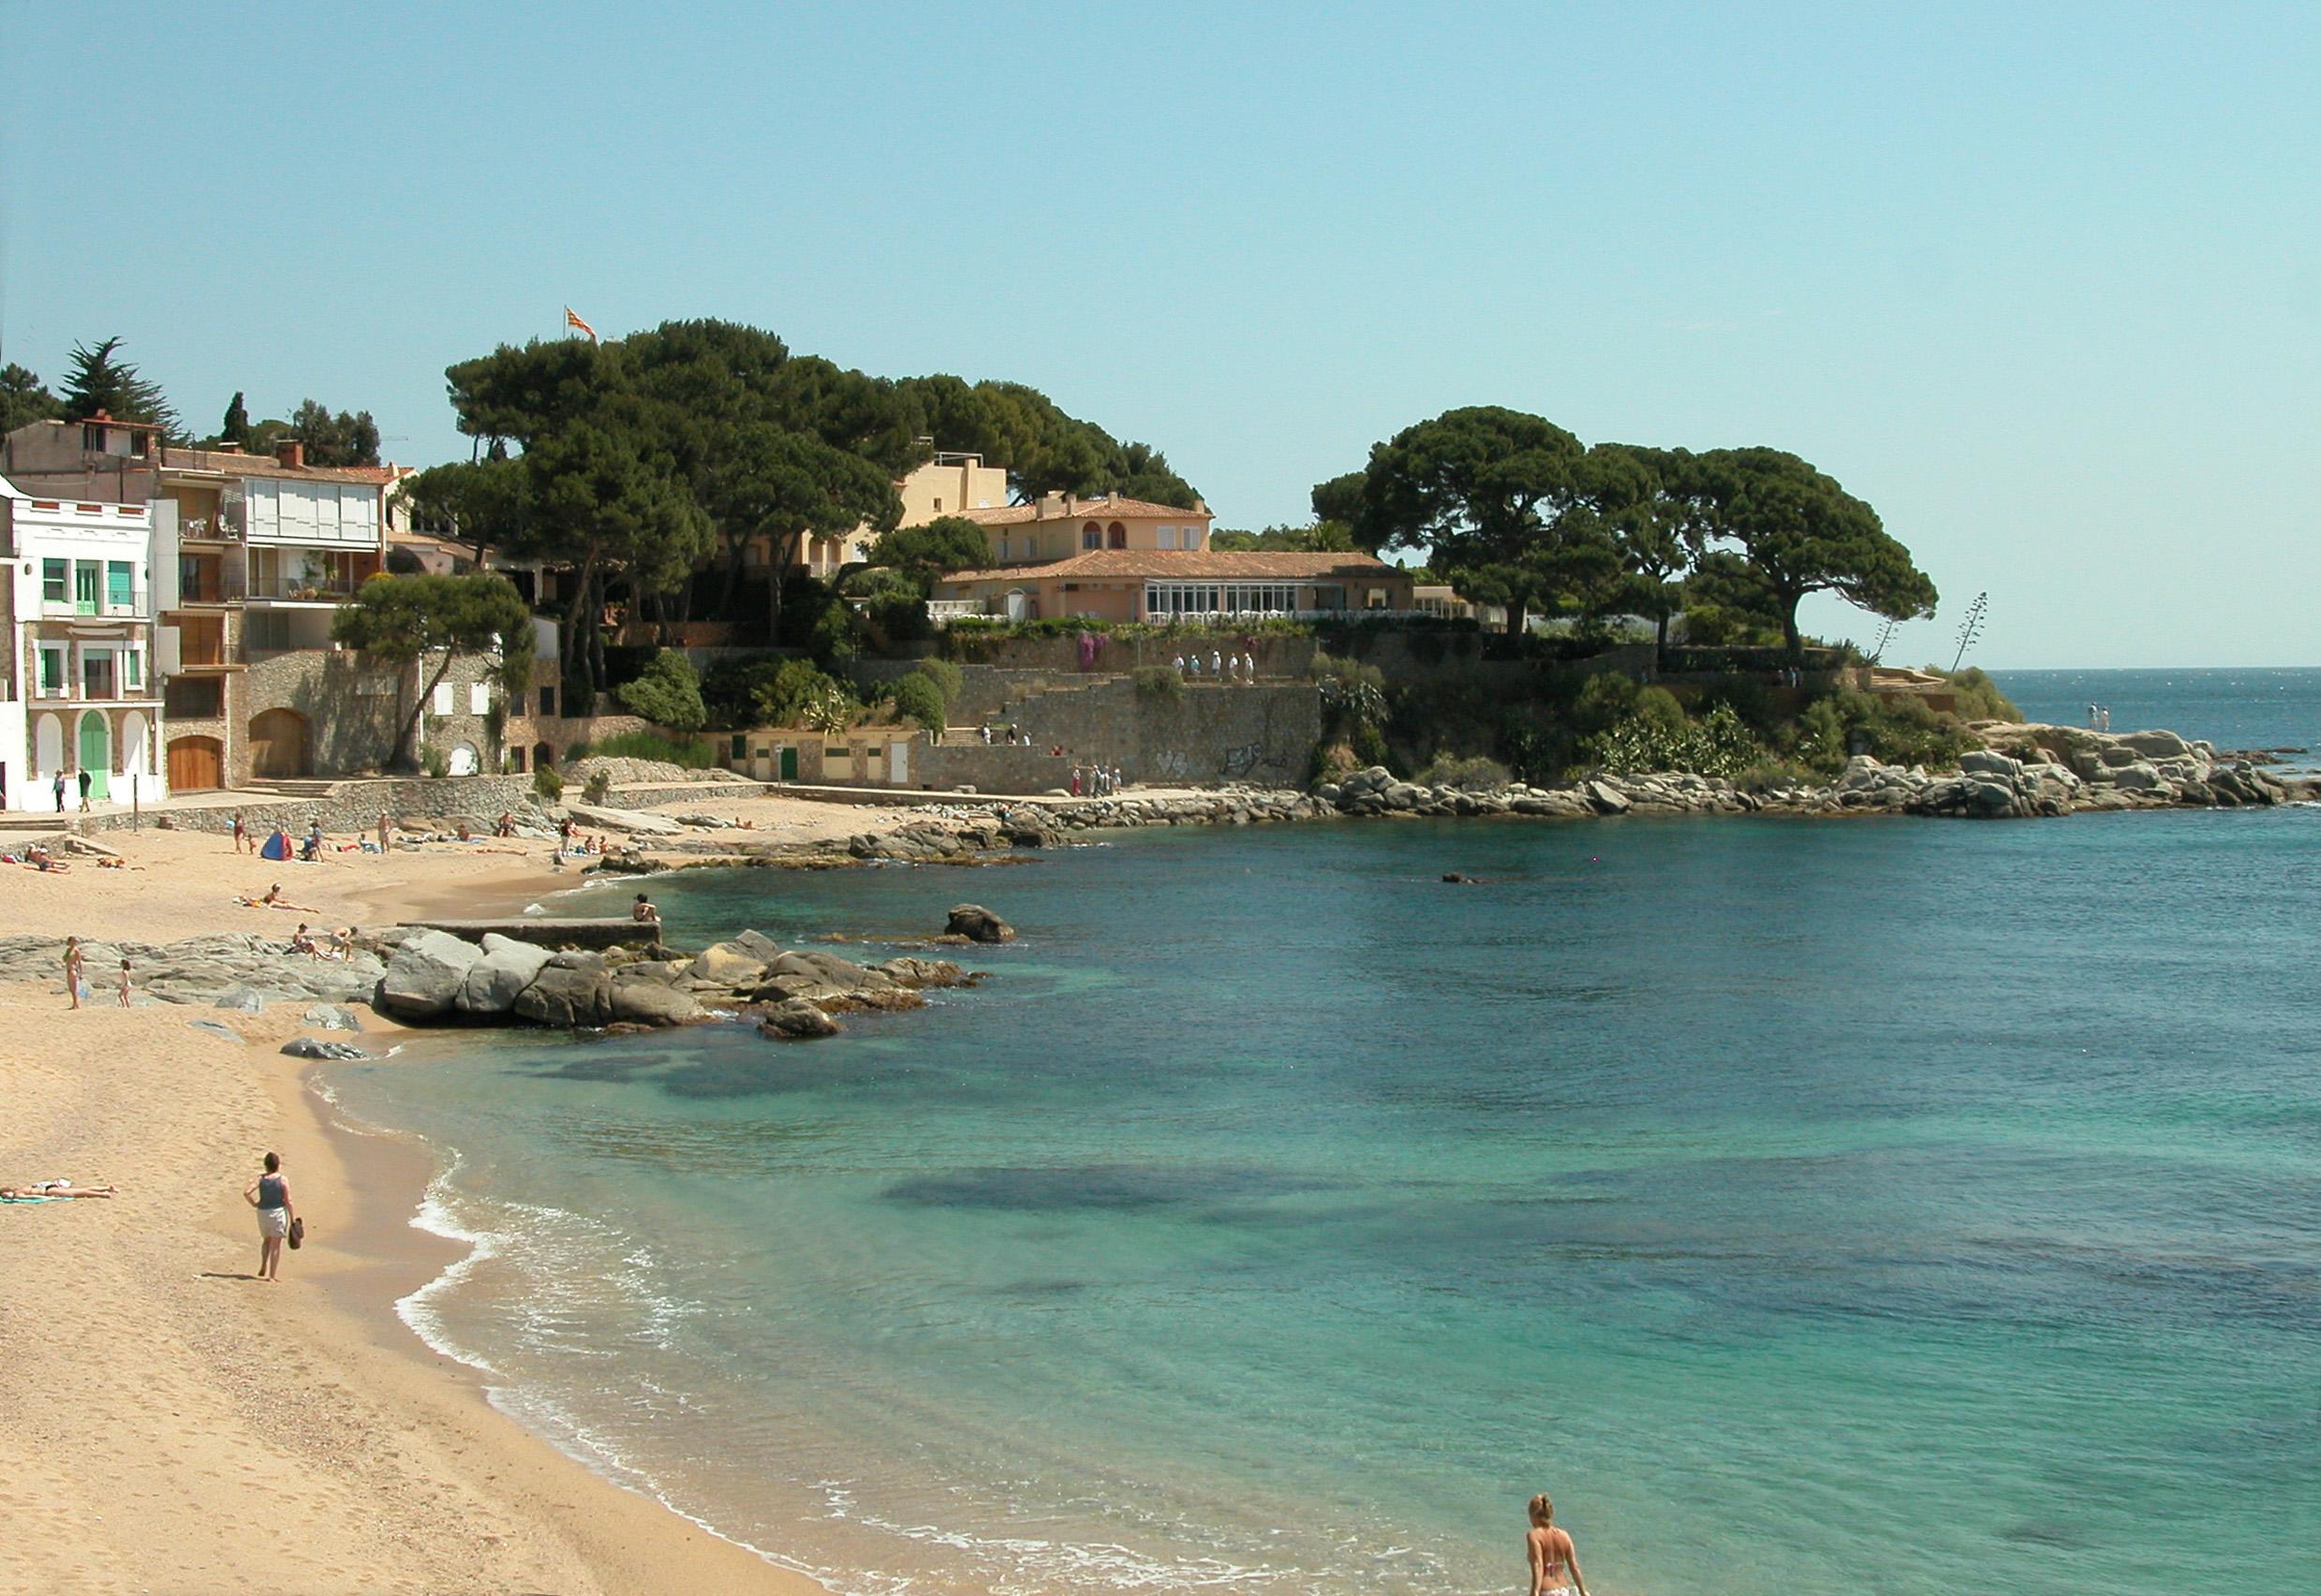 Playa El Perejil